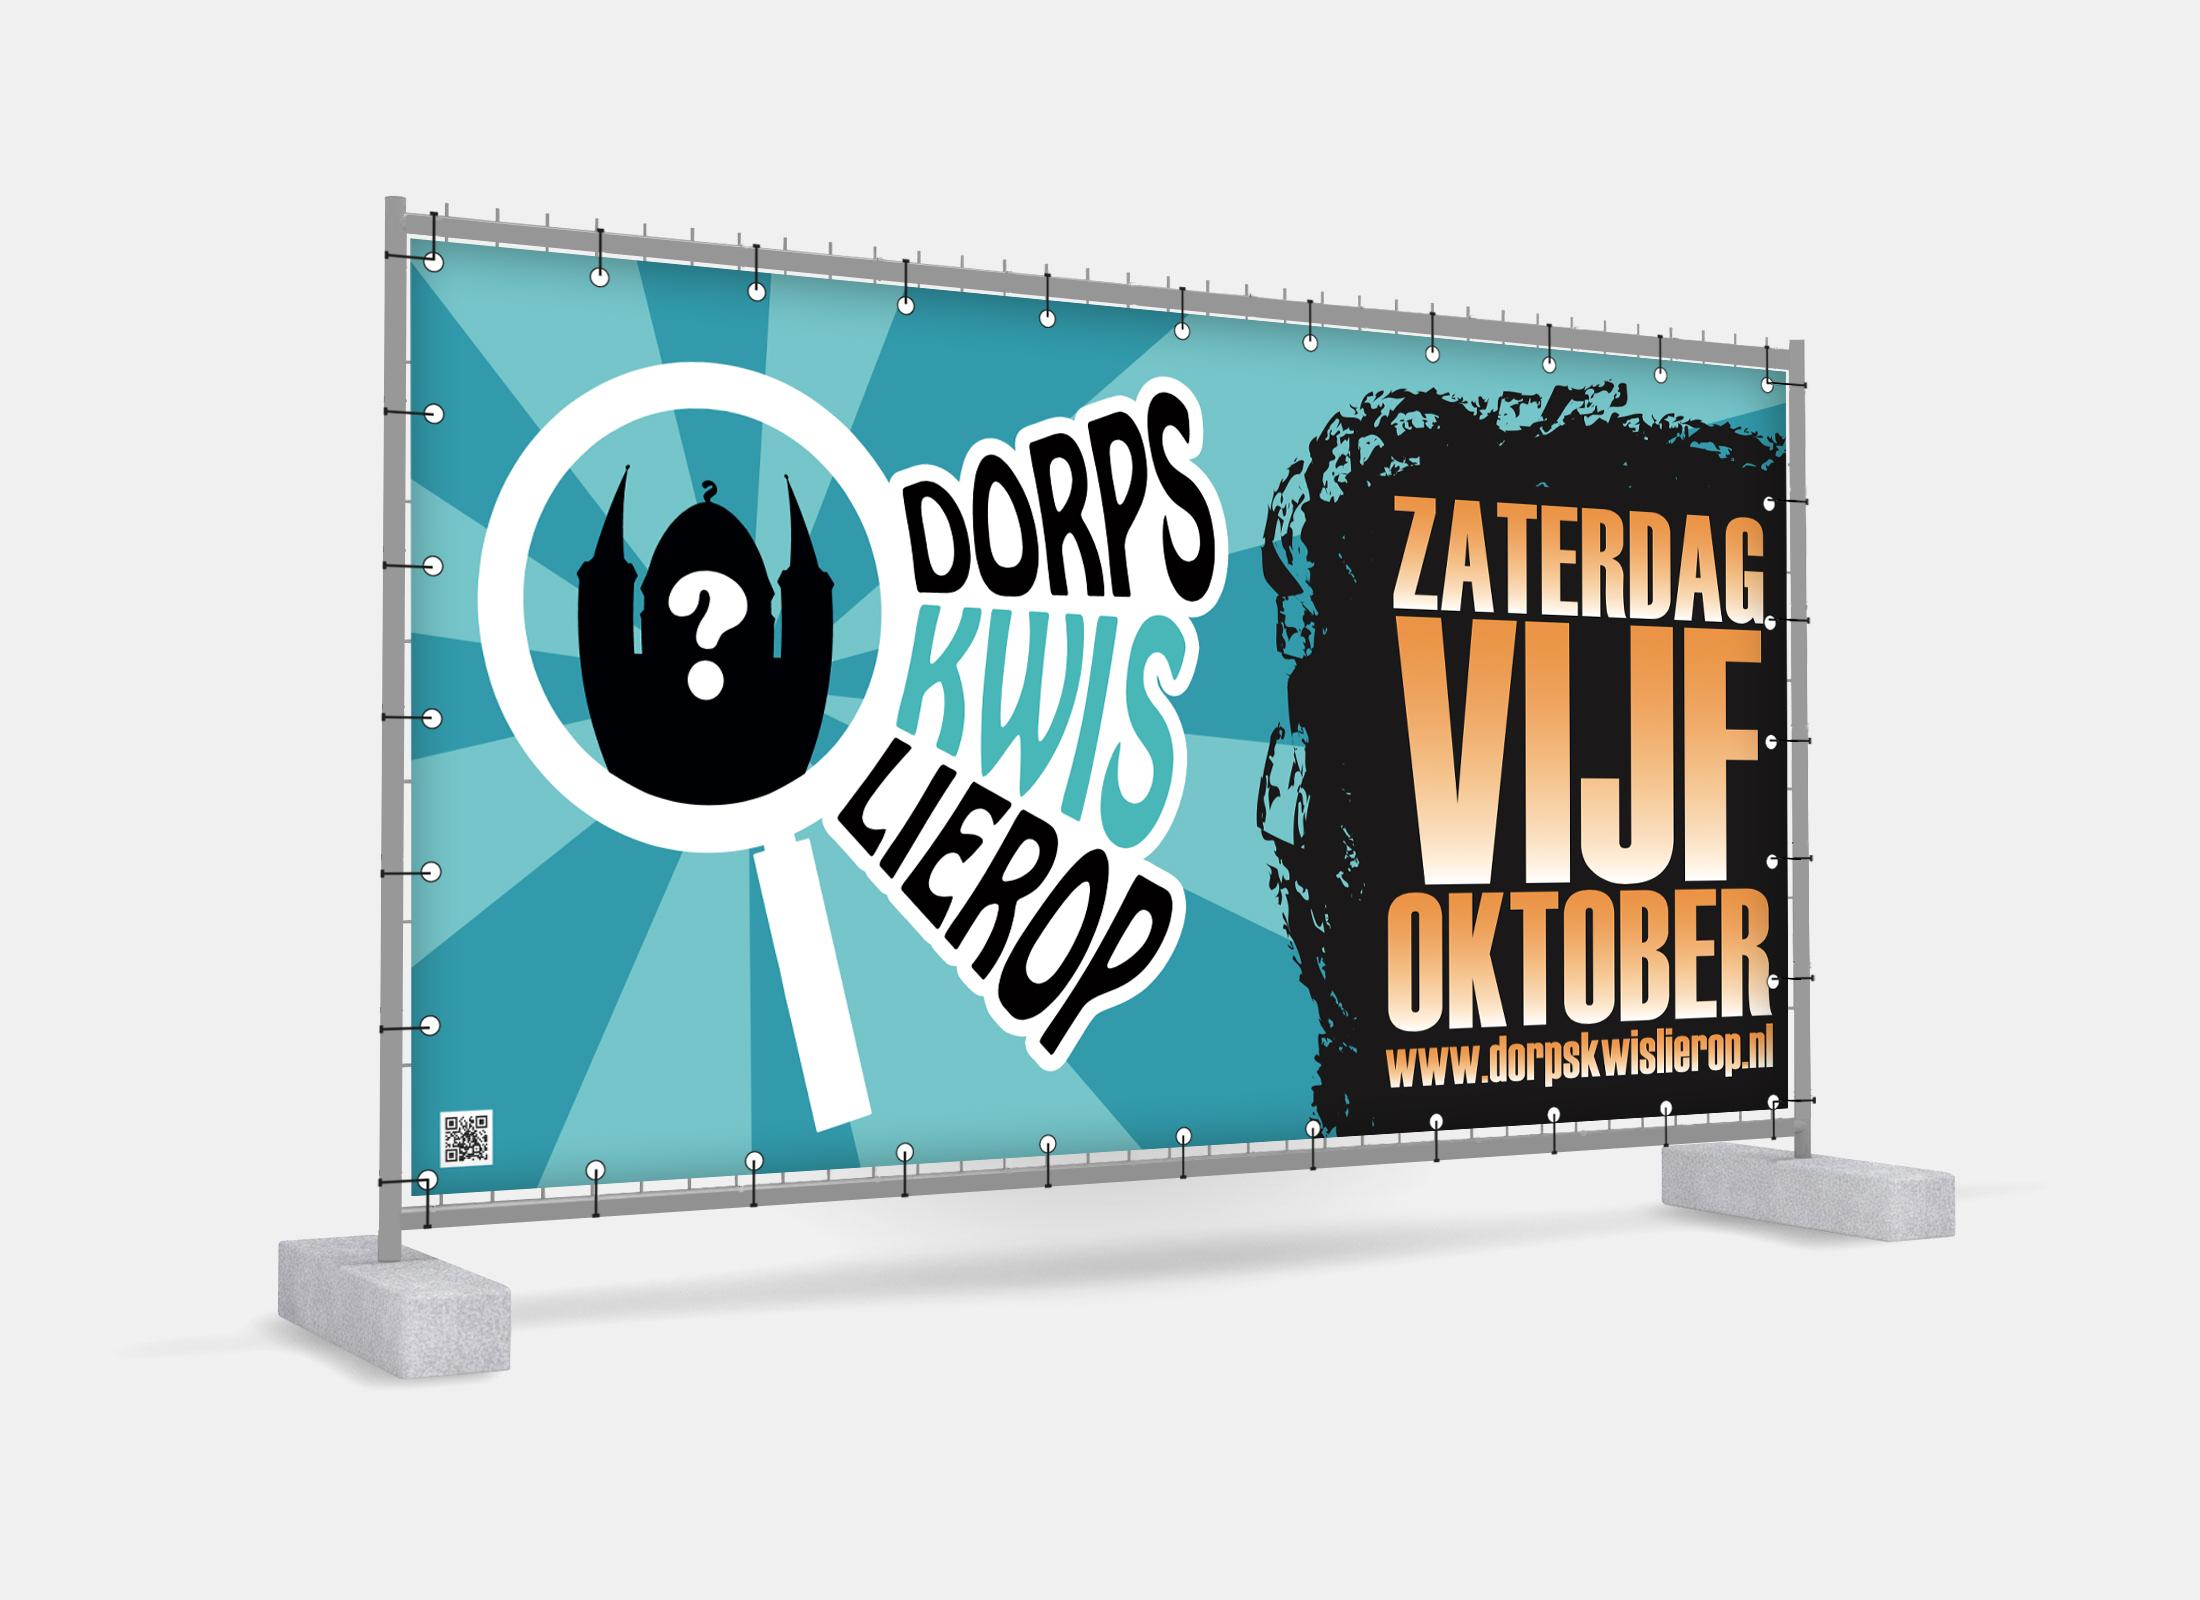 bouwhek-banners-dorpskwis-lierop